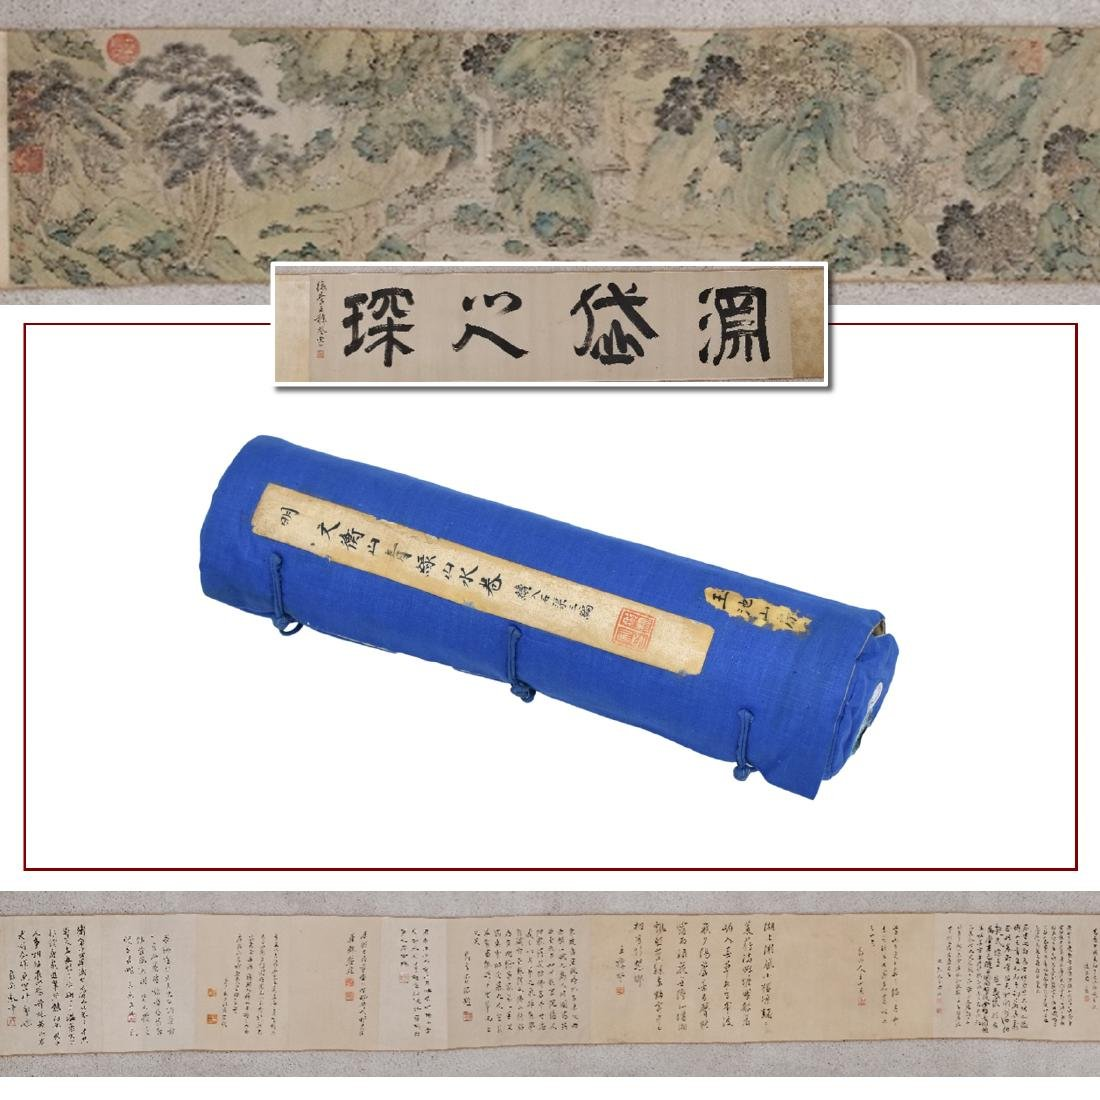 RARE CHINESE WATERFALL LONG HAND SCROLL PAINTING